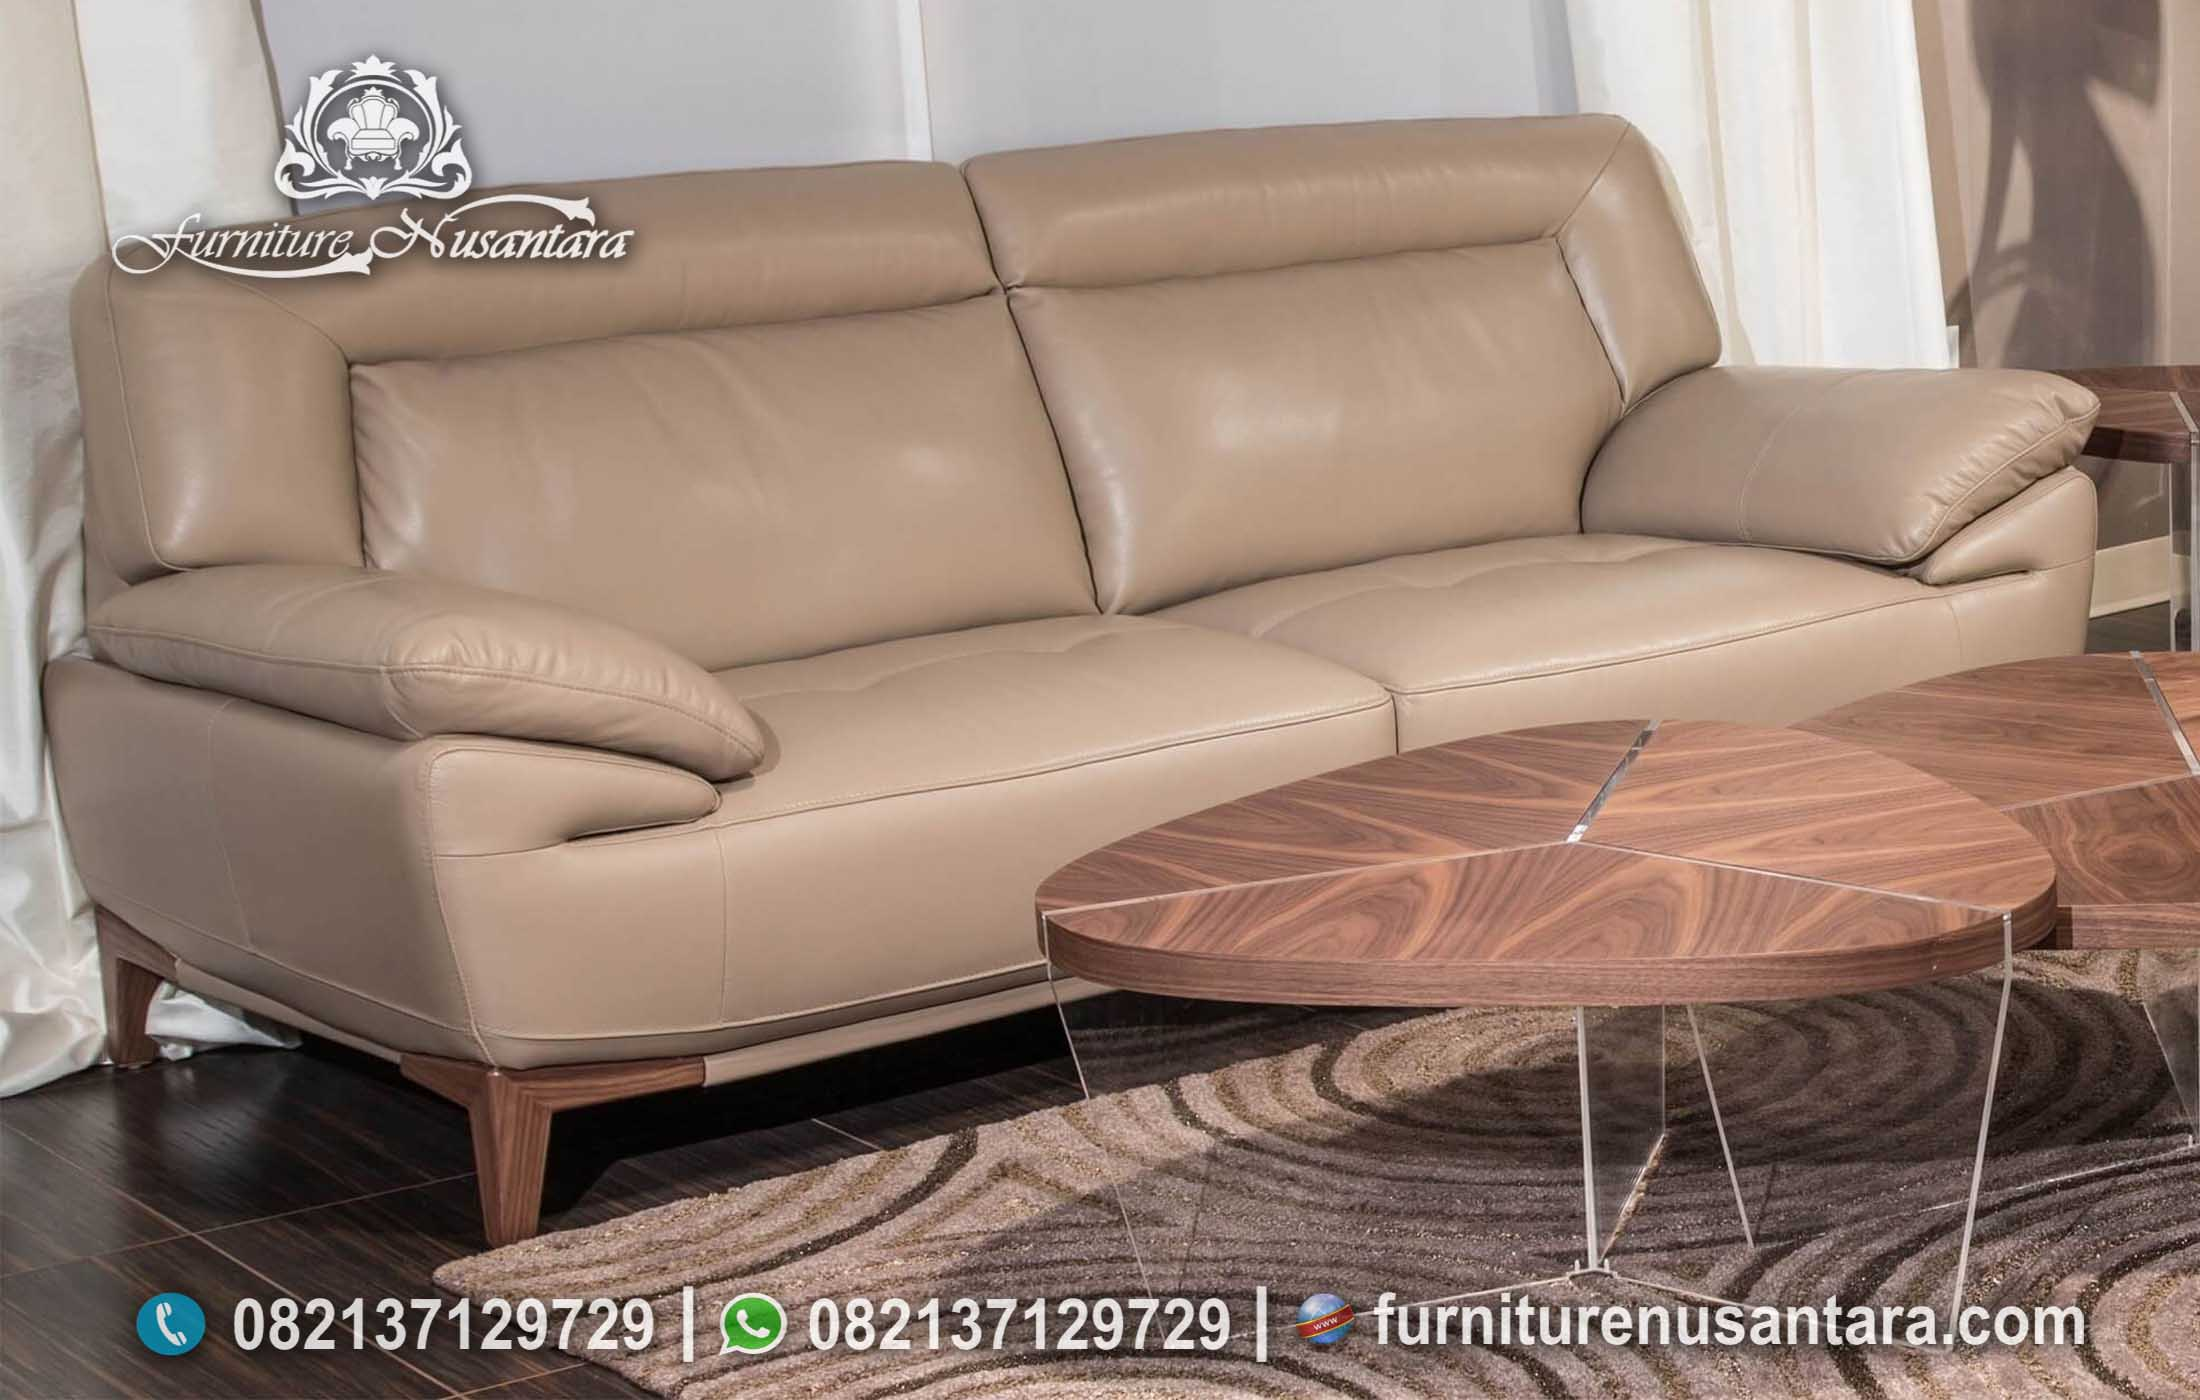 Sofa Bed 2 Dudukan Nyaman ST-95, Furniture Nusantara